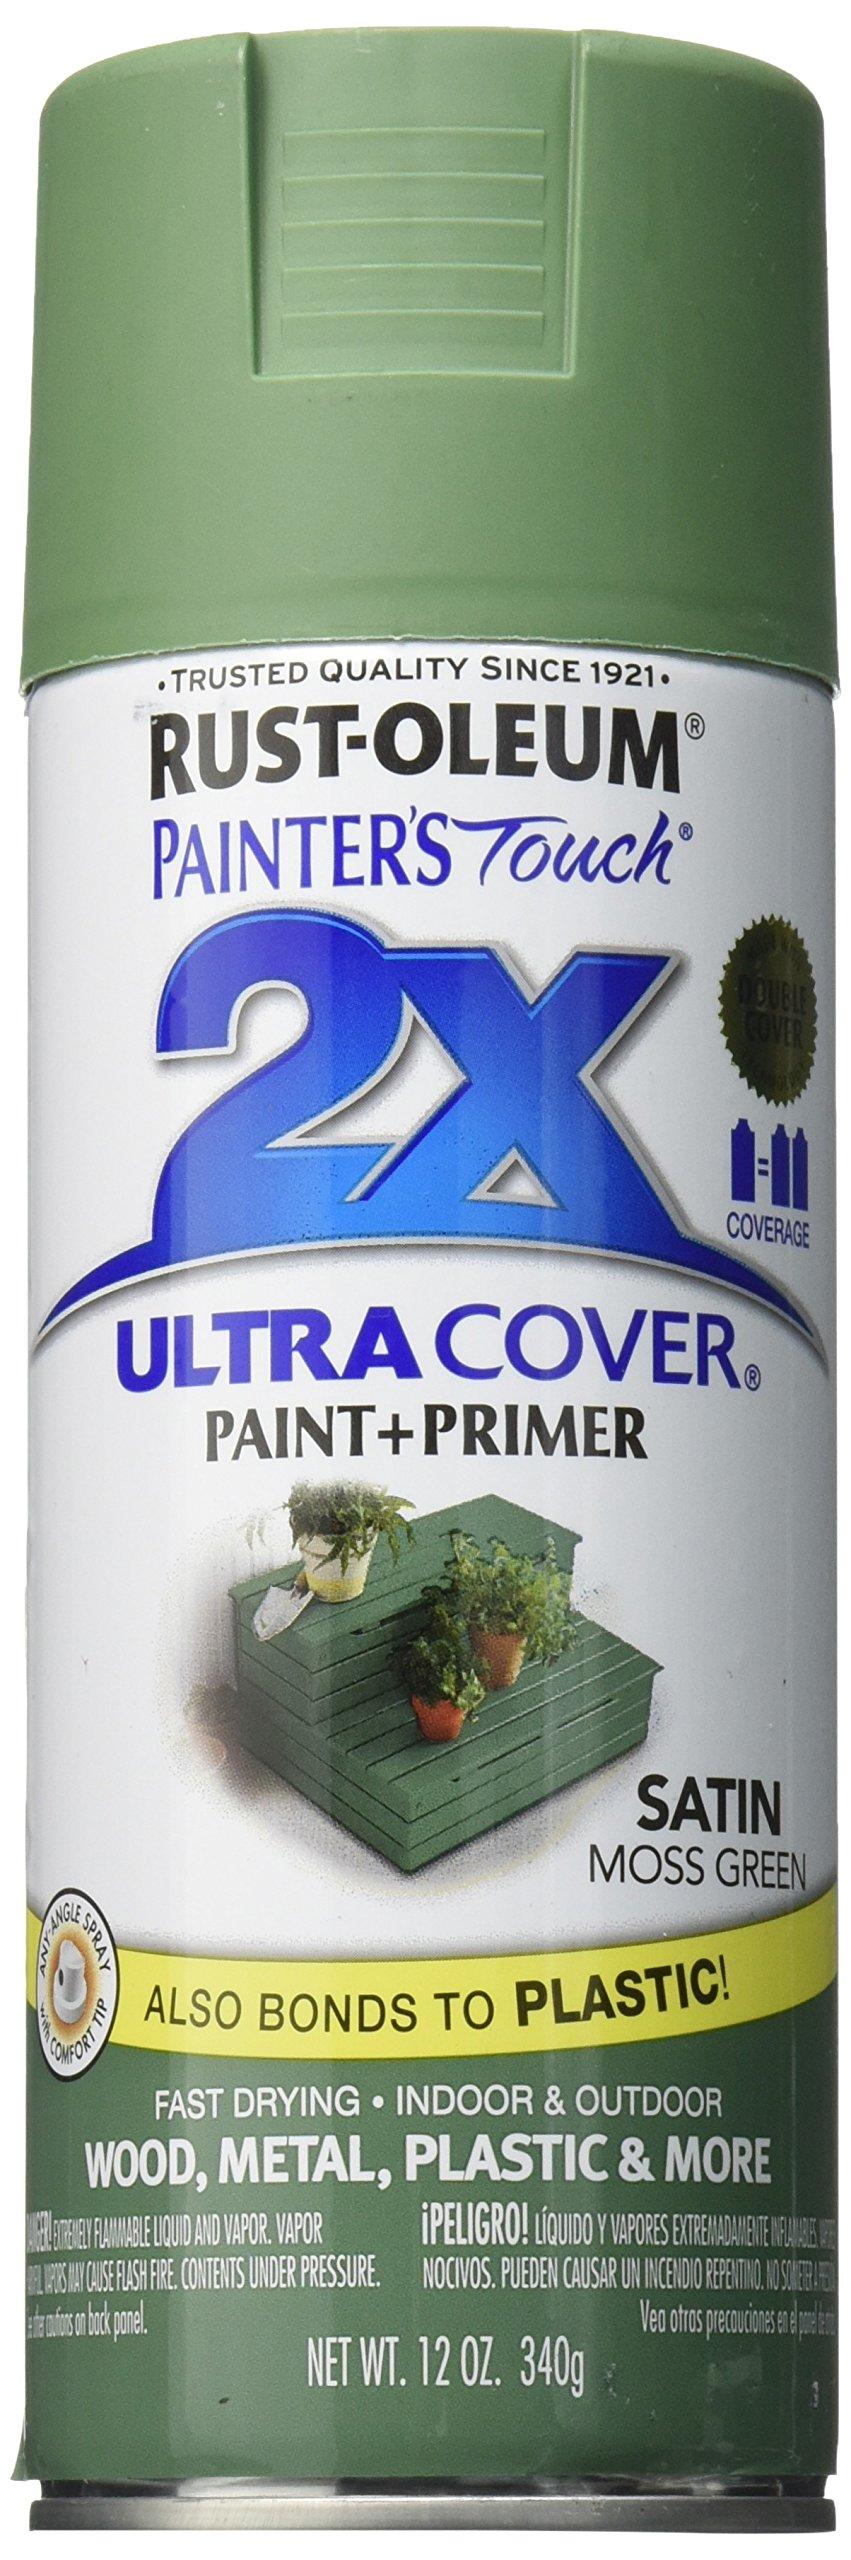 Rust-Oleum 249071 Painter's Touch Multi Purpose Spray Paint, 12-Ounce, Satin Moss Green